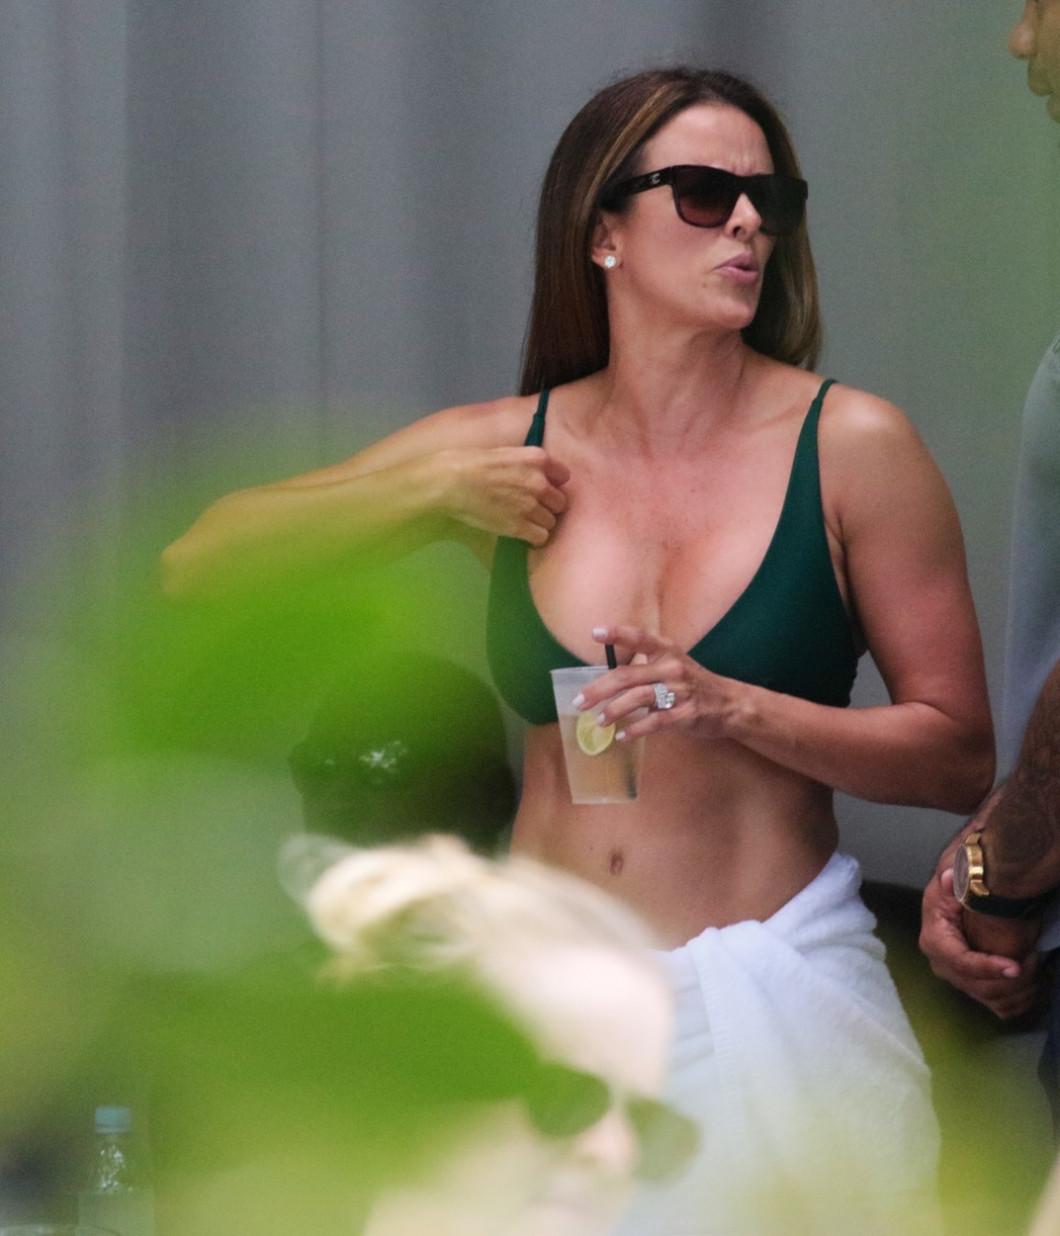 EXCLUSIVE: Michael Jordan smokes a cigar while his wife dancings in a green bikini at a pool party in Miami